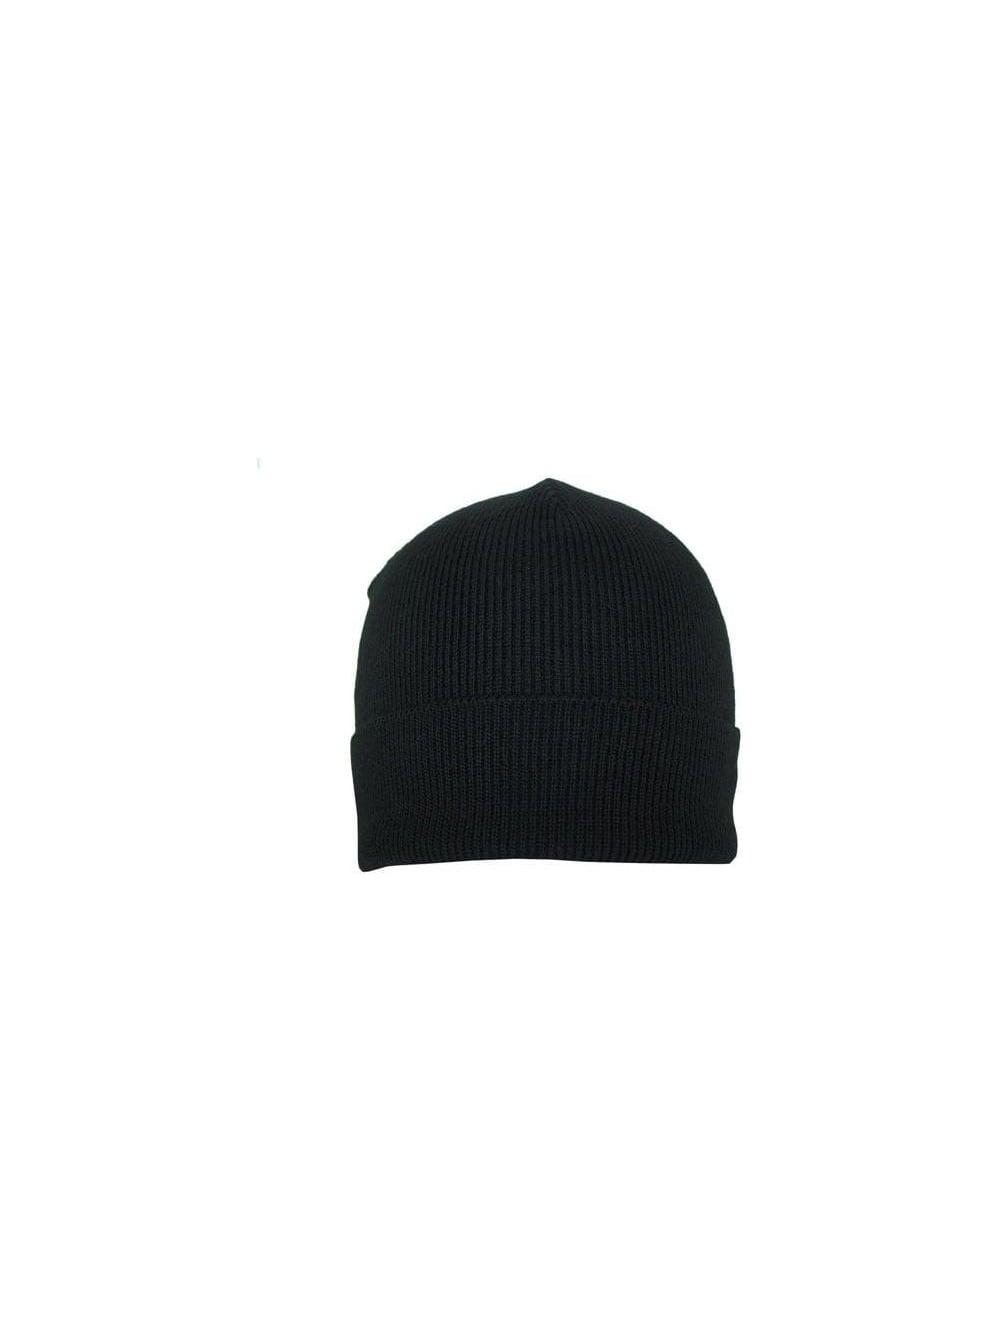 8cdc85fb4 Fomero Beanie - Black